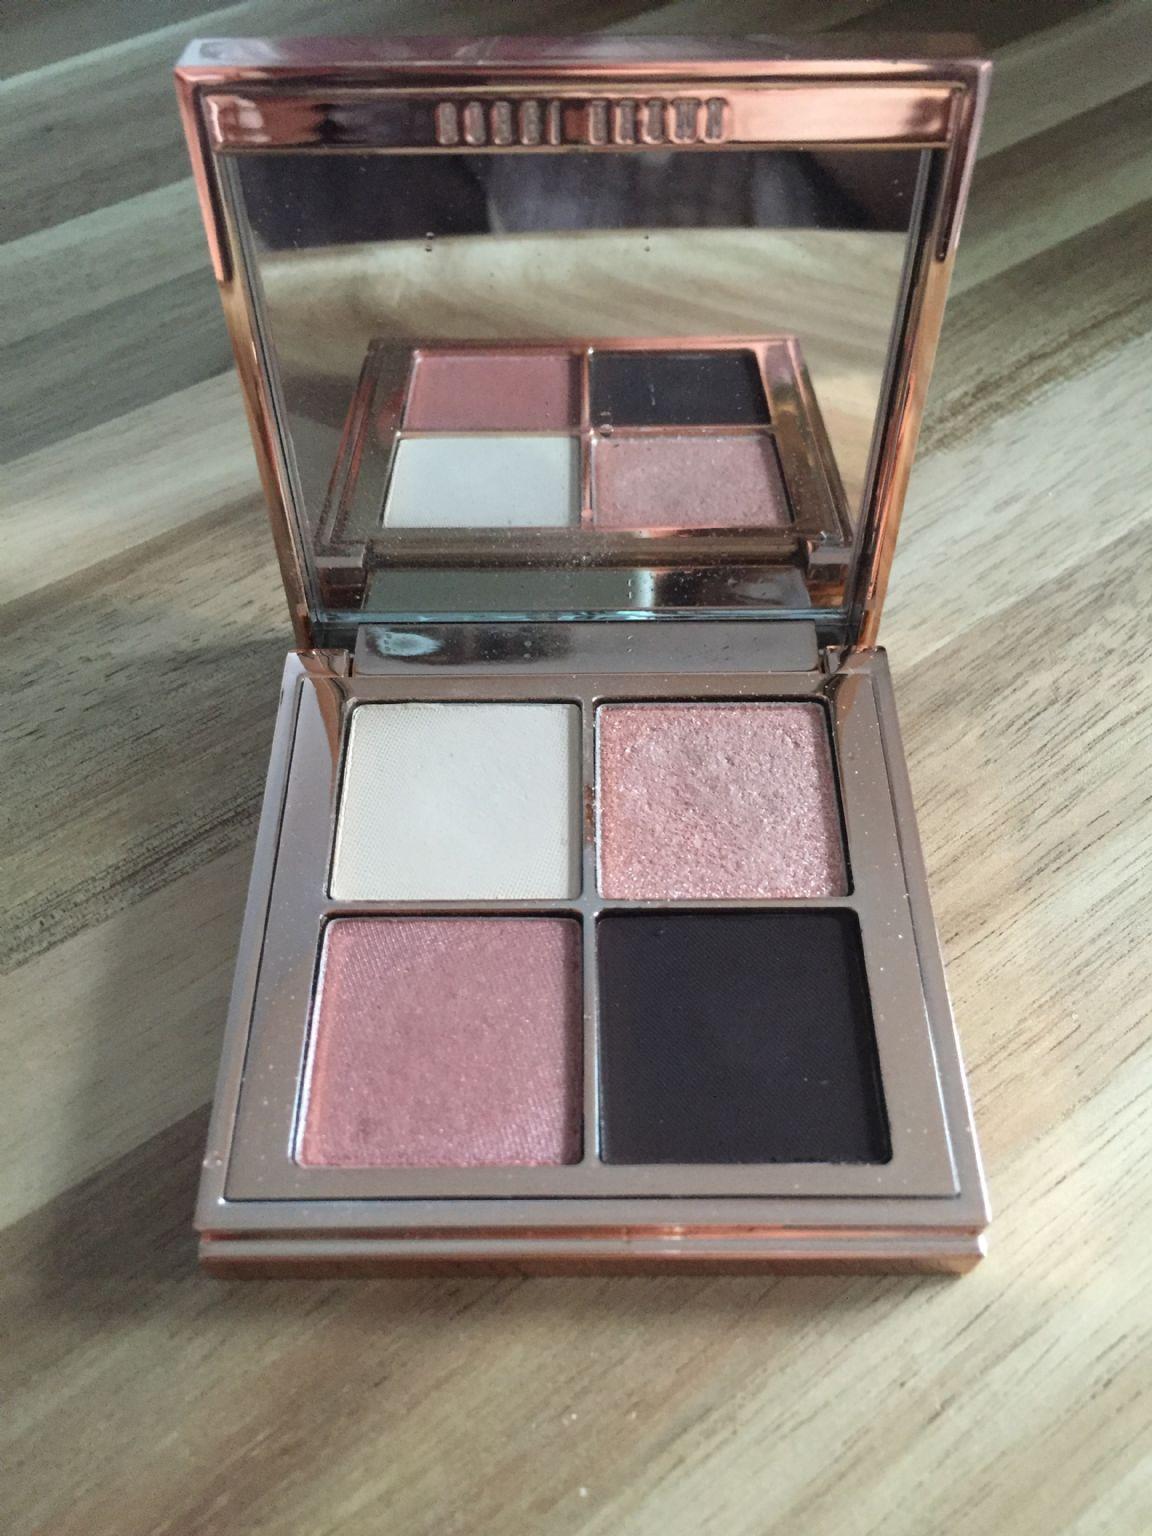 Bobbi Brown Sunkissed Nude Eye Palette Reviews, Photos